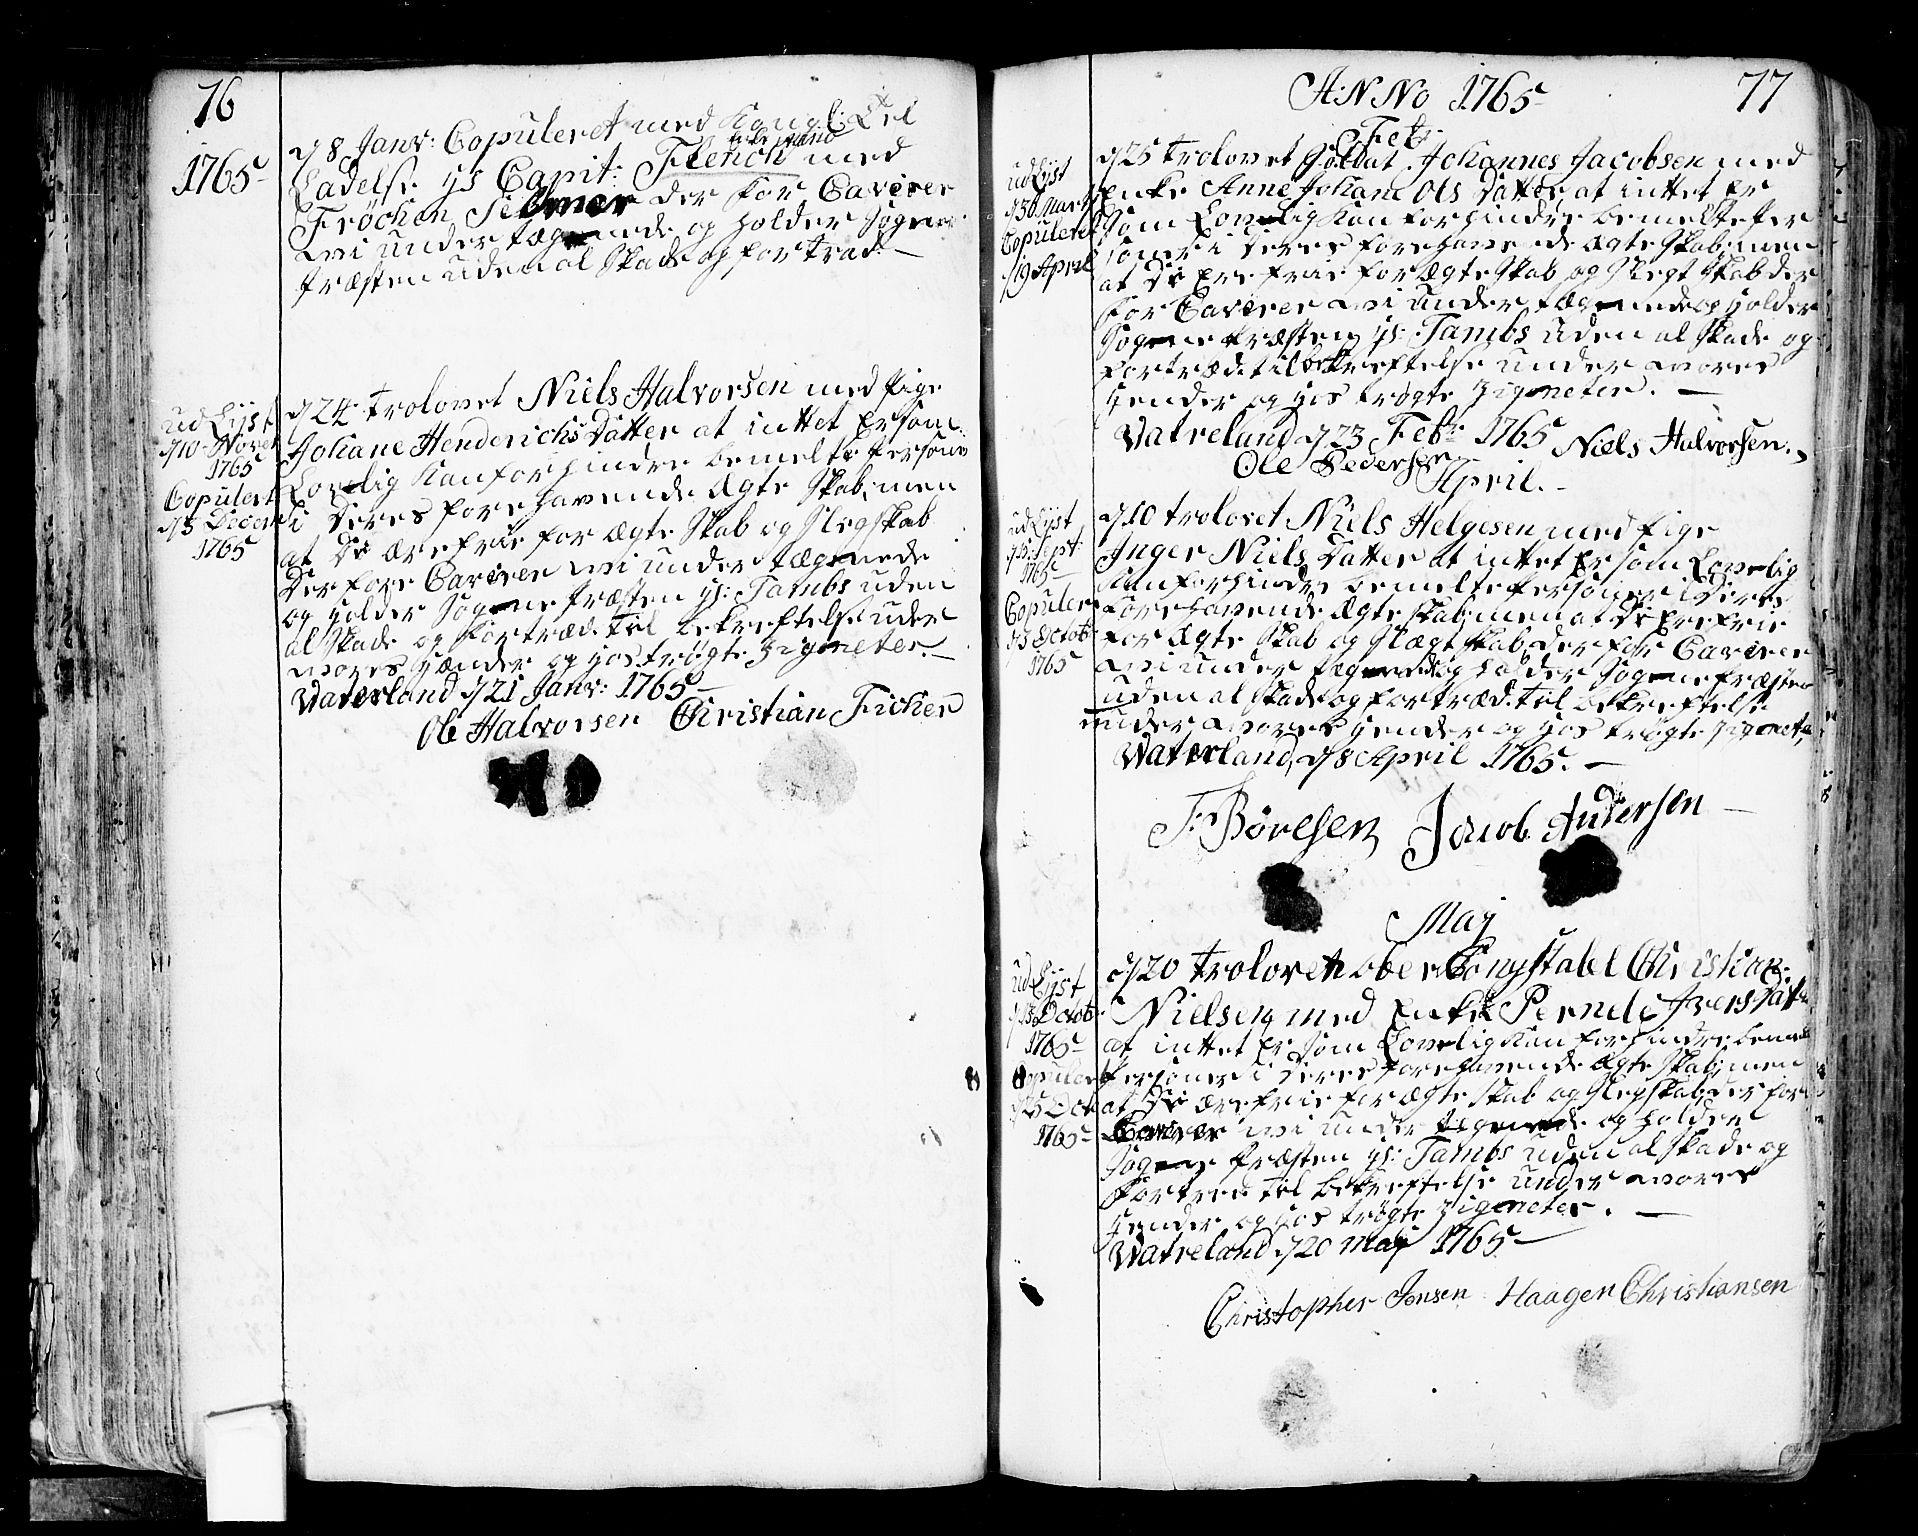 SAO, Fredrikstad prestekontor Kirkebøker, F/Fa/L0002: Ministerialbok nr. 2, 1750-1804, s. 76-77